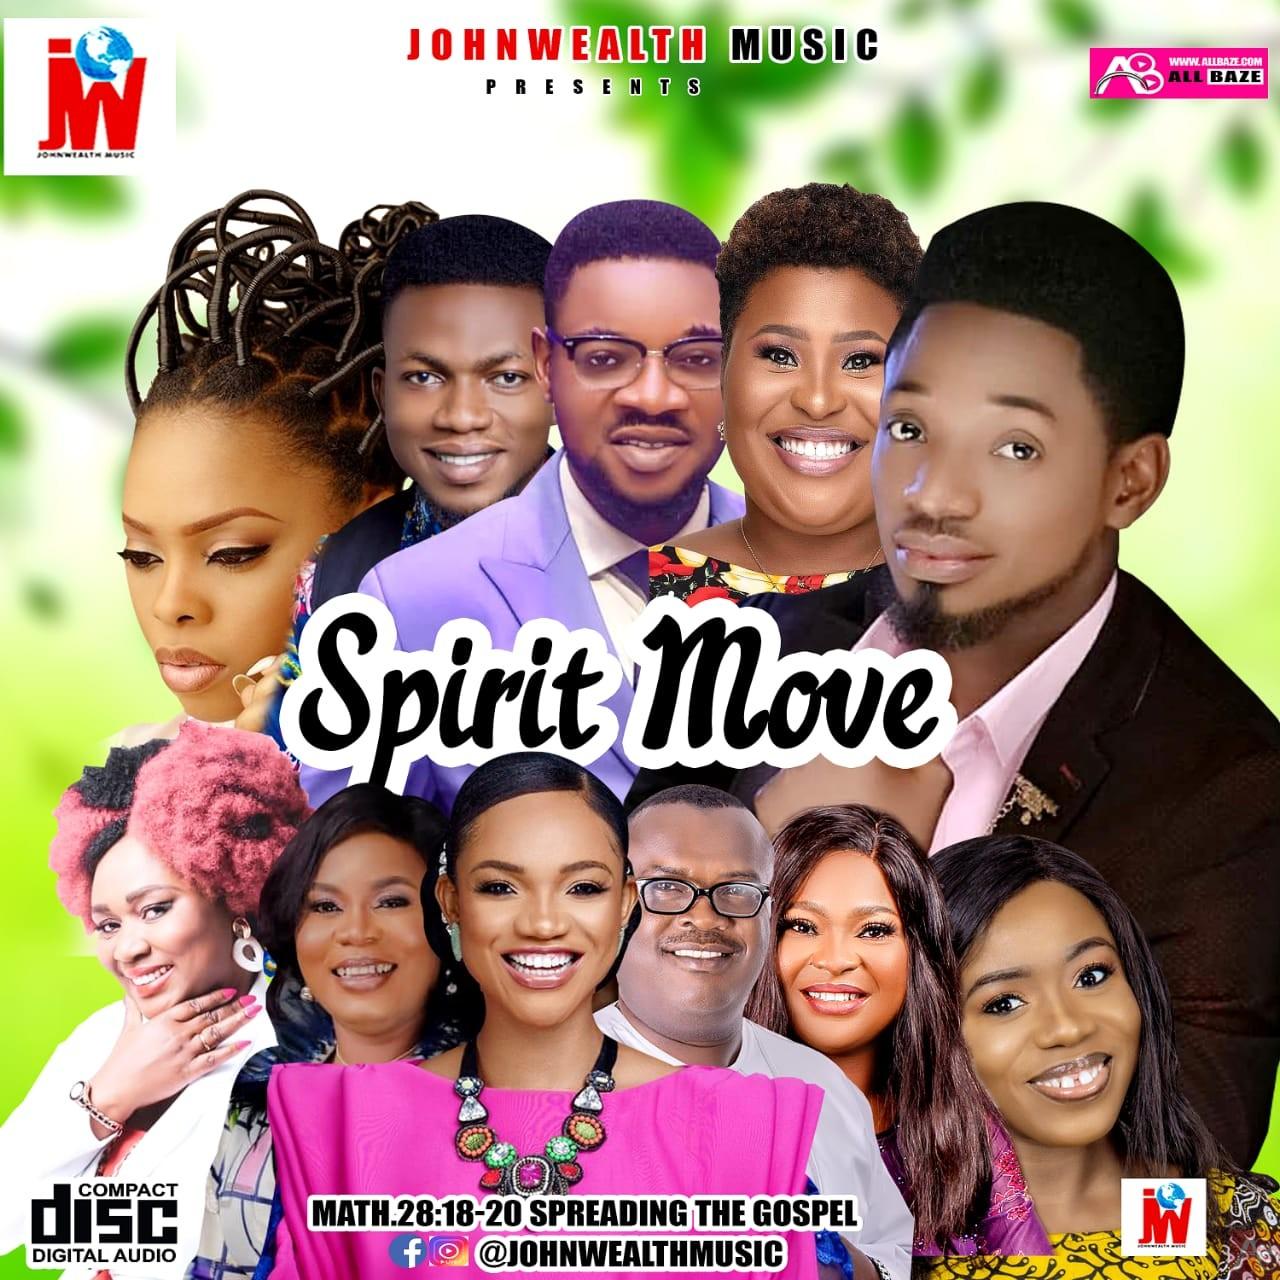 Johnwealth Music - Spirit Move Gospel Mixtape